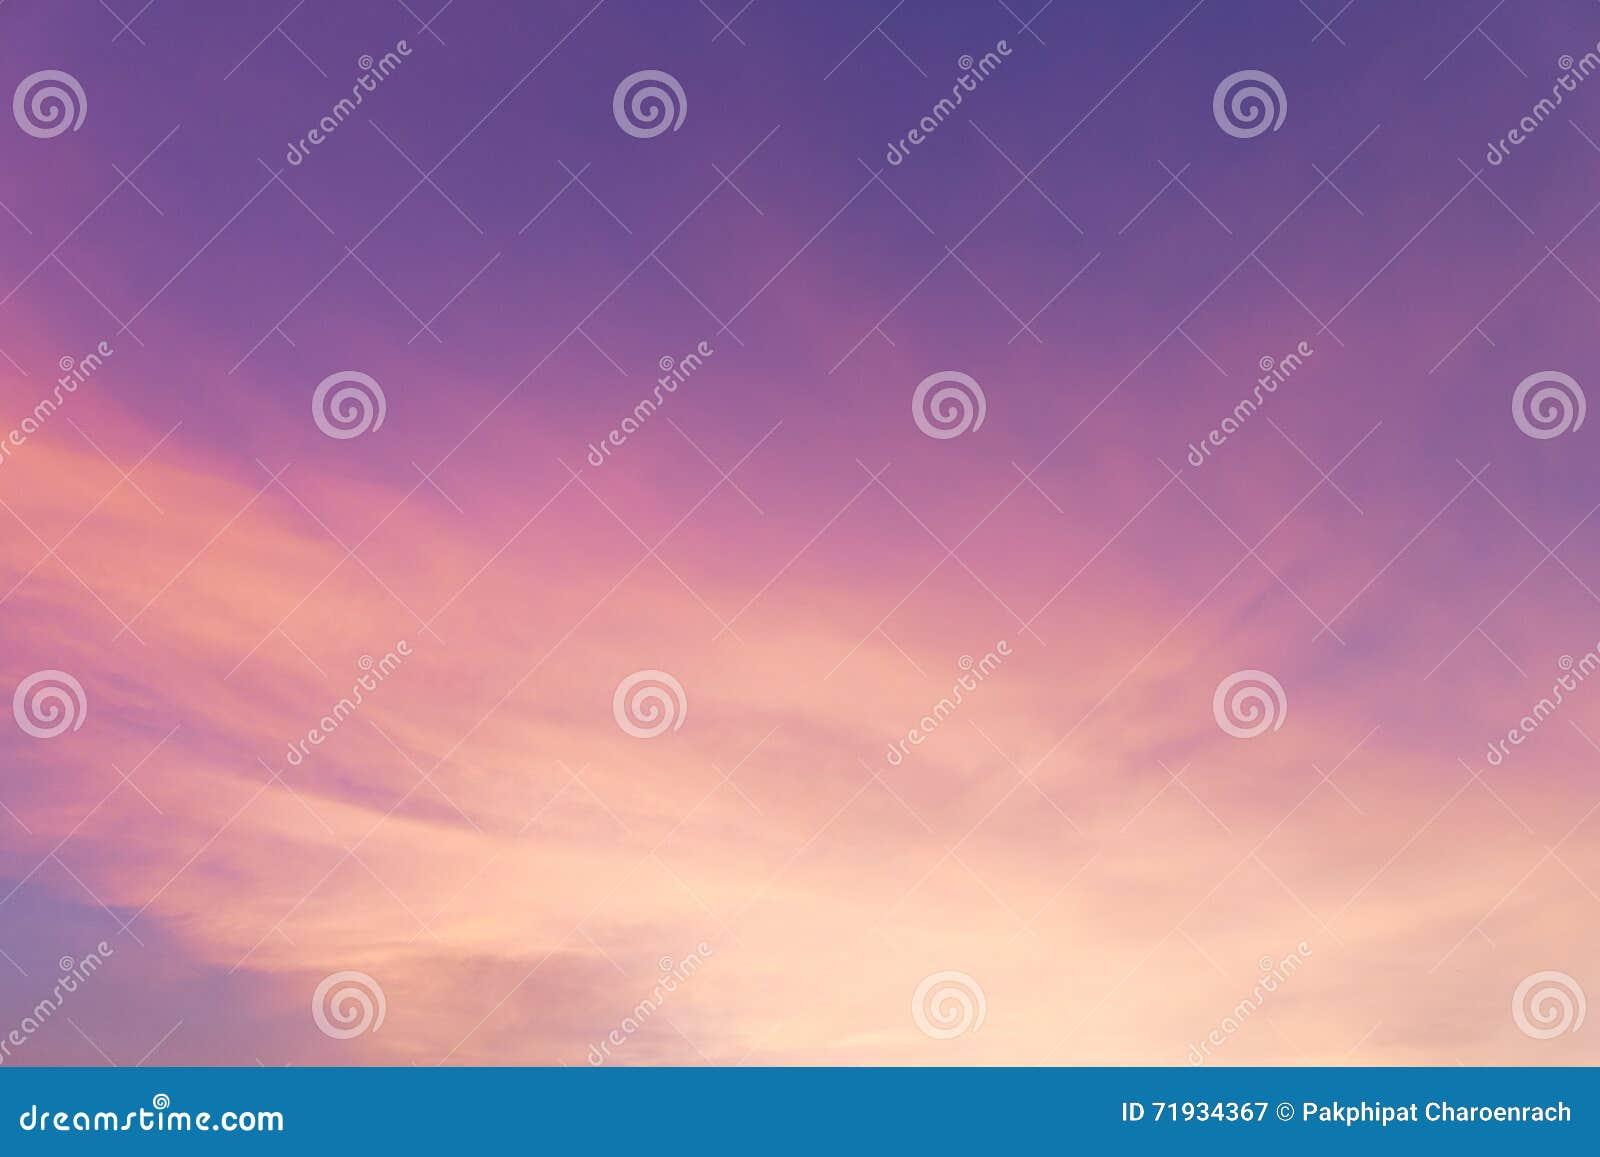 Красивое небо захода солнца и пасмурная предпосылка